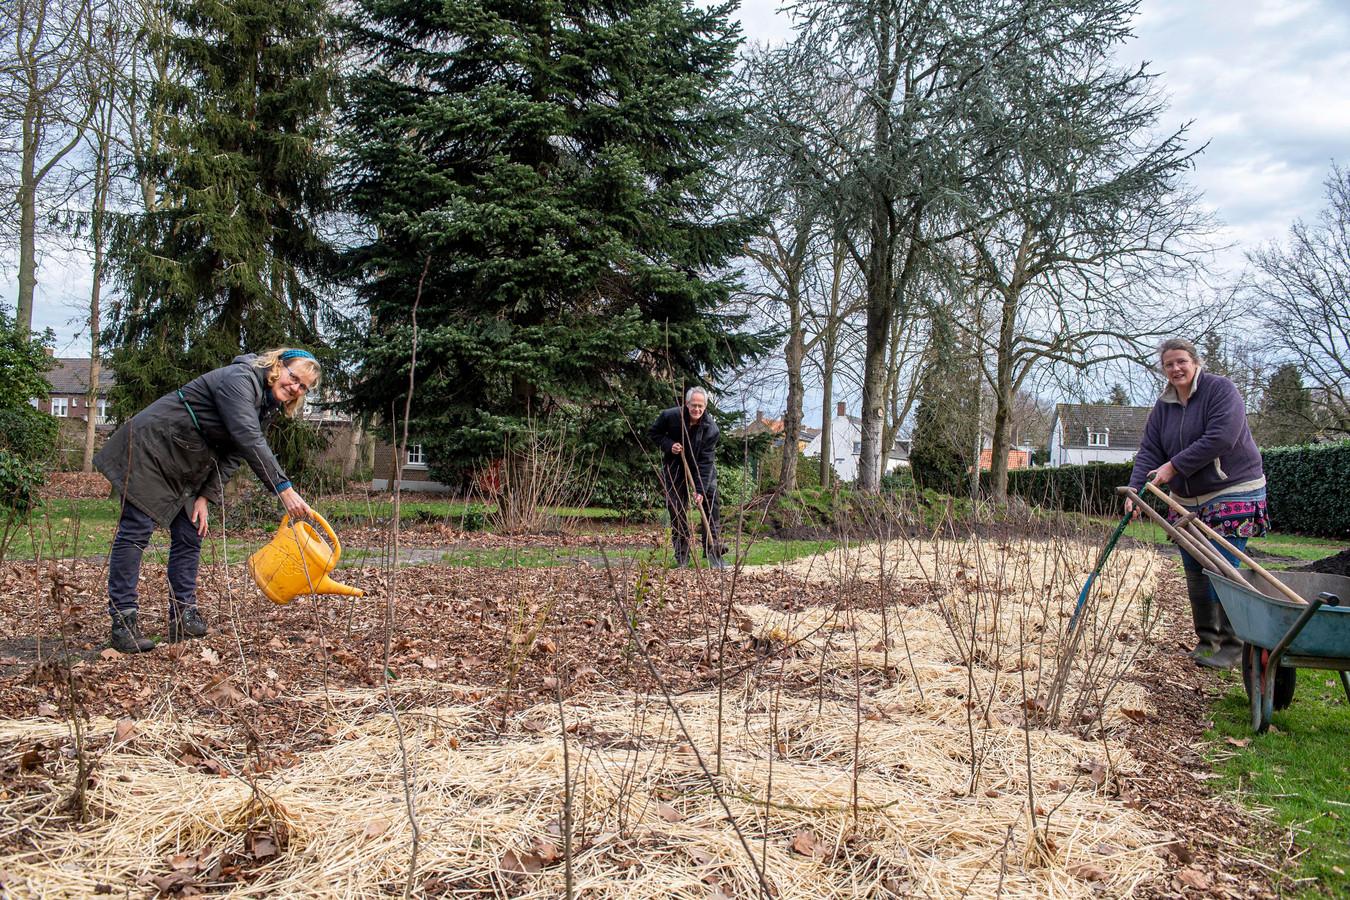 De initiatiefnemers en hun Tiny Forest. V.l.n.r. : Marjan Bosch, Rob Knipping & Monica Versluis